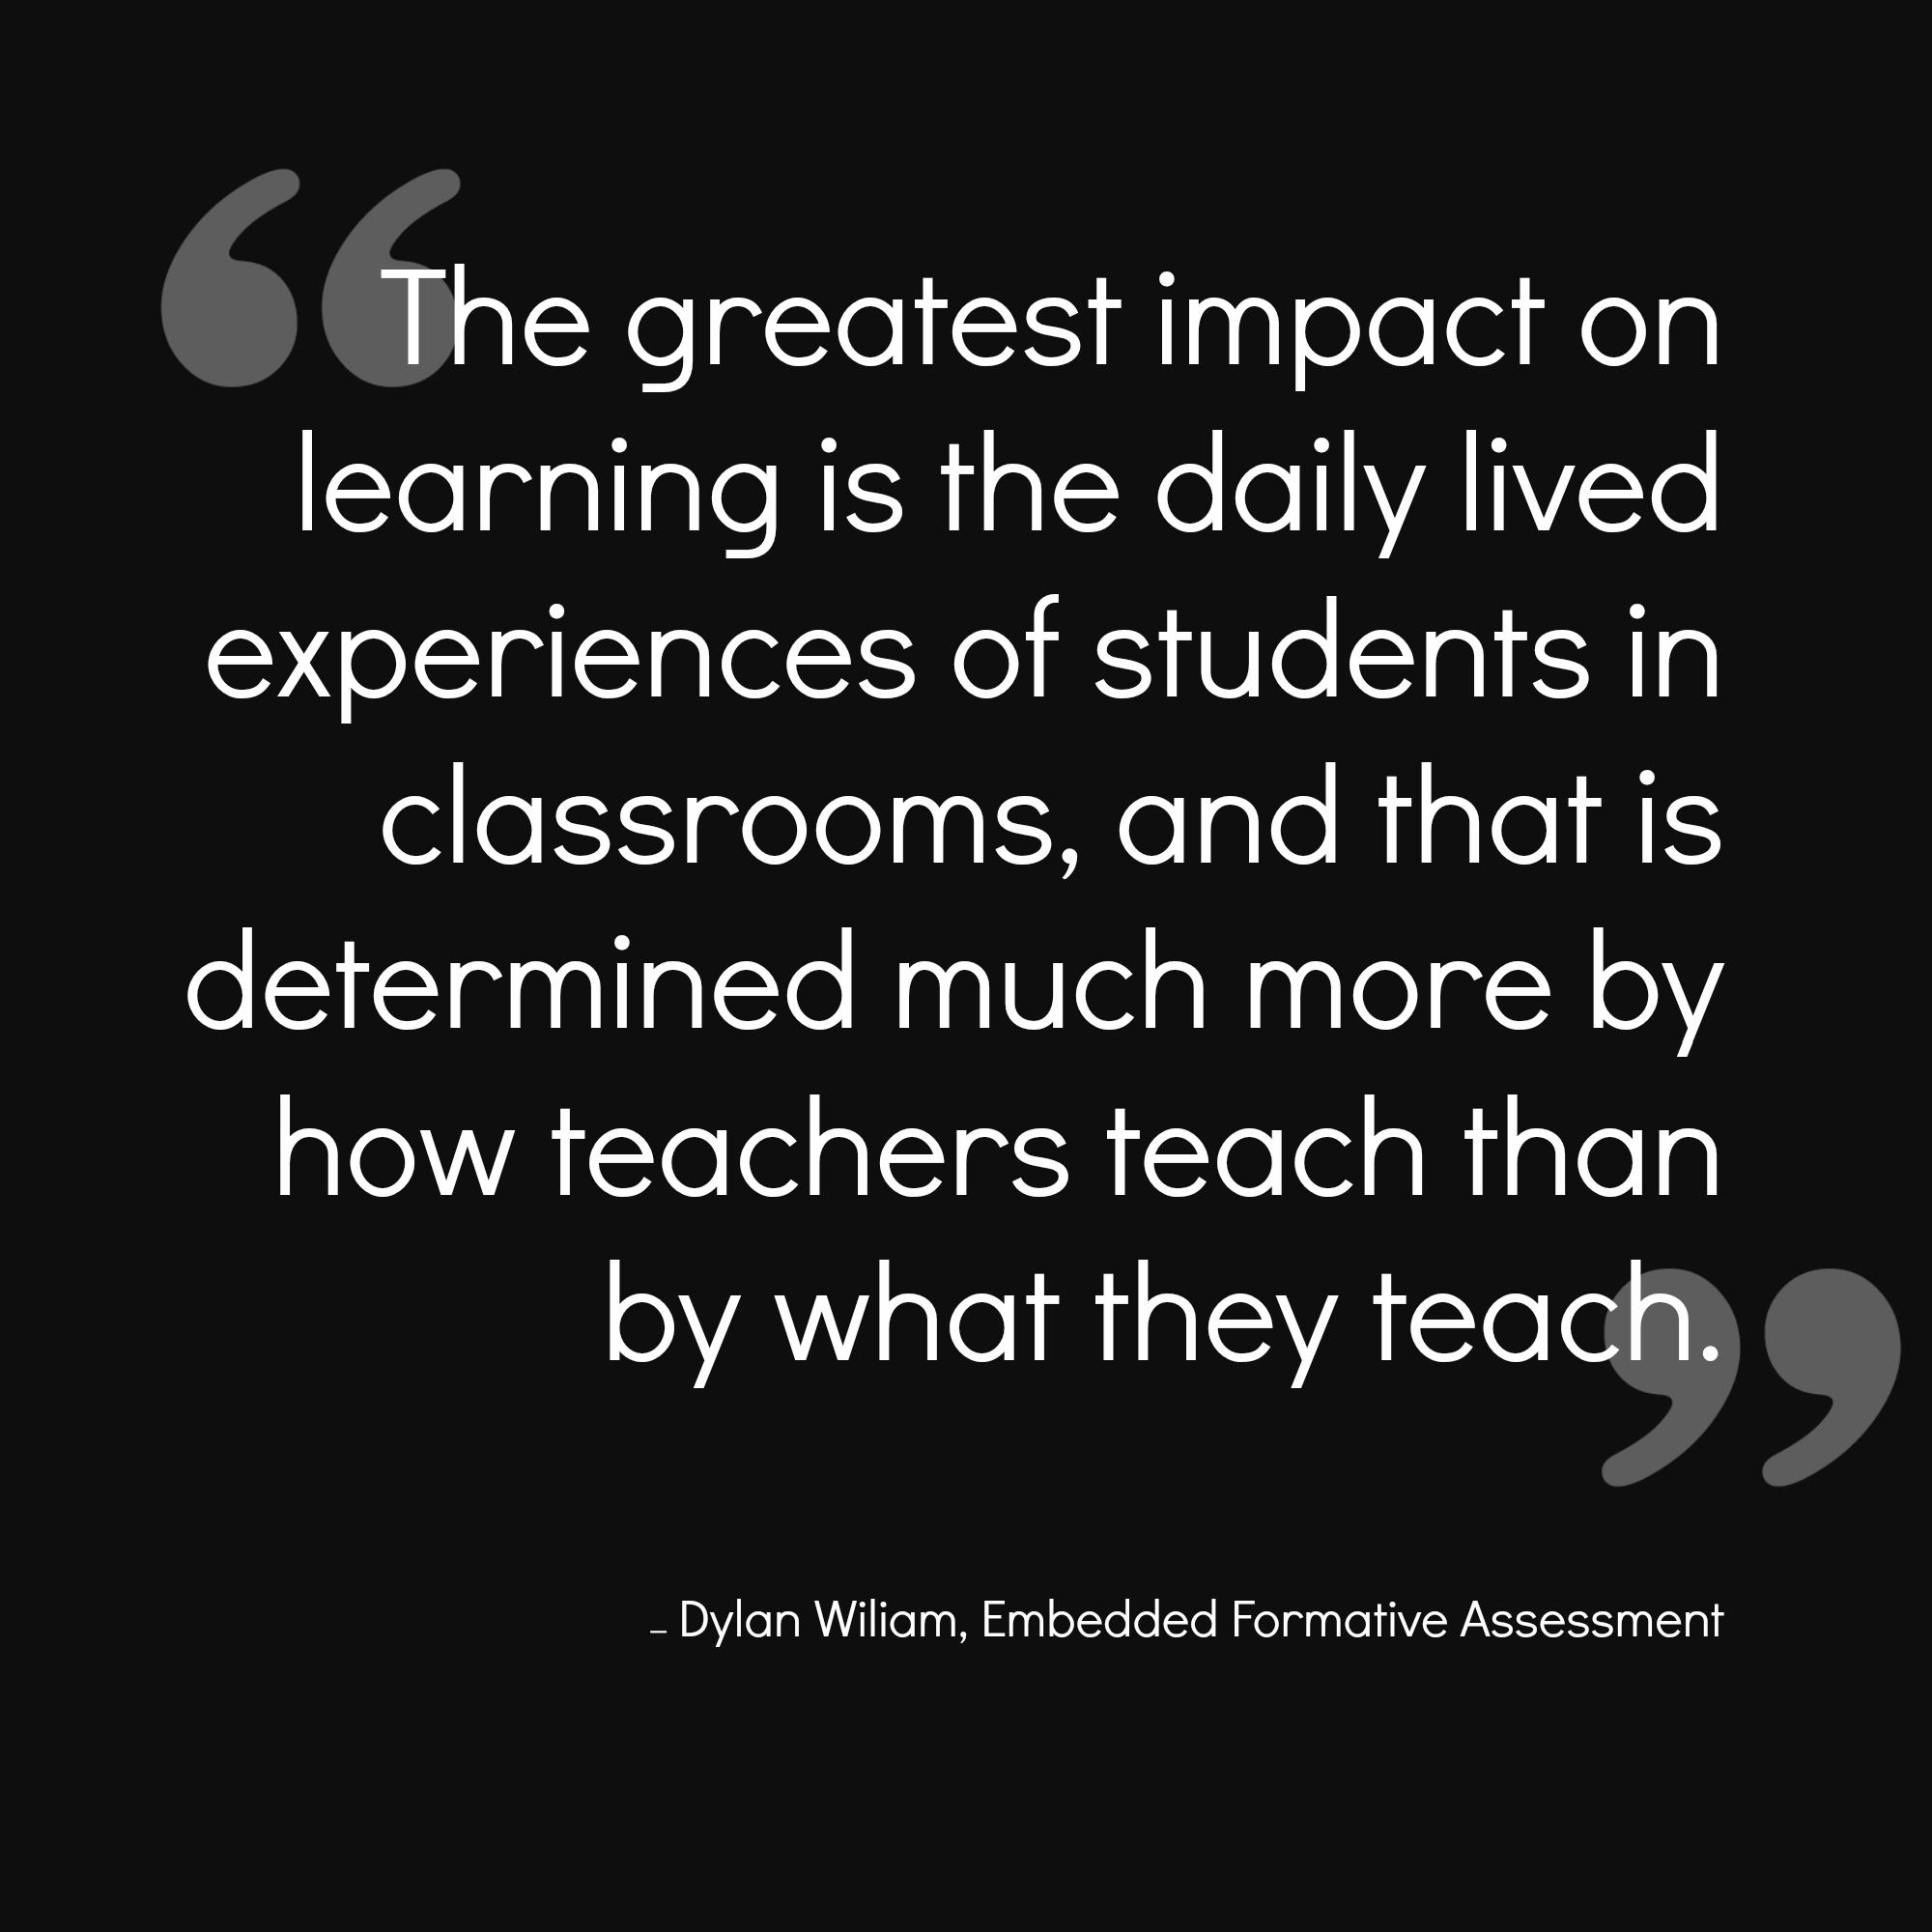 greatest-impact-on-learning (1).jpg